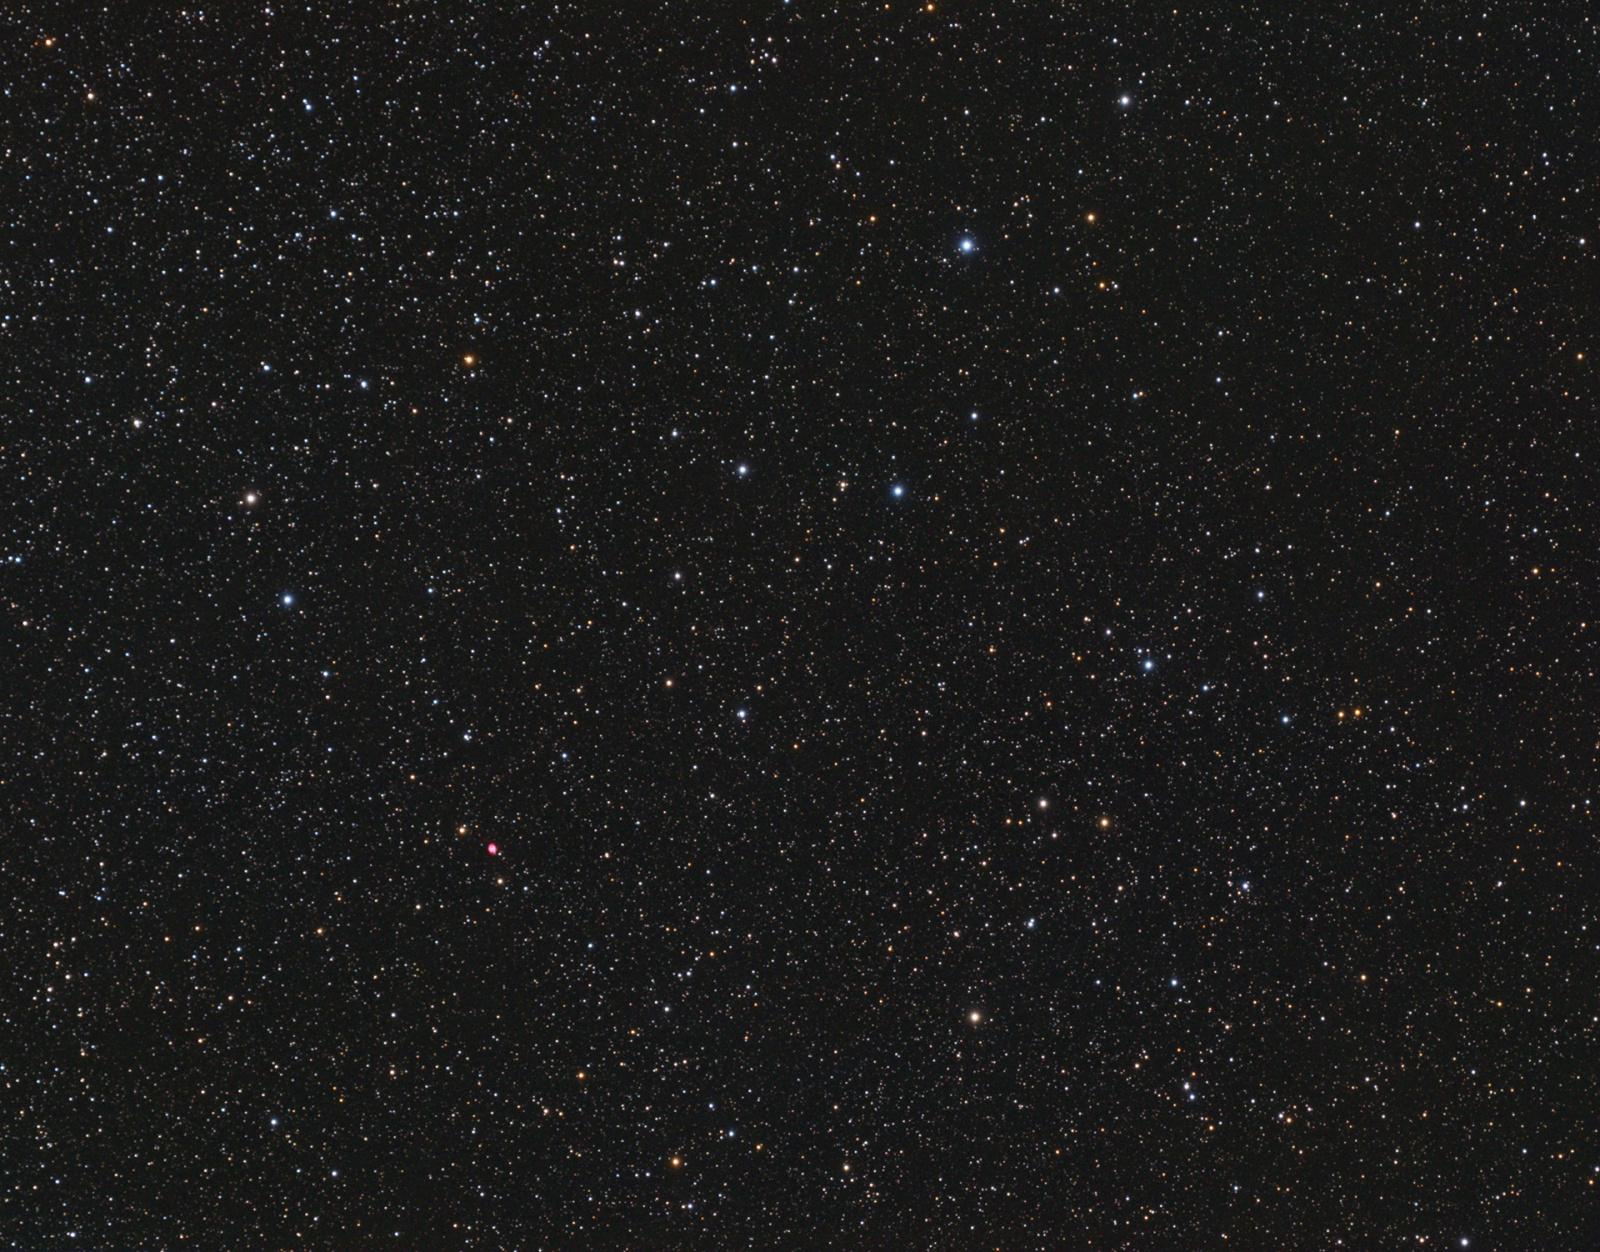 CTA1_RGB.thumb.jpg.117b8cf6212067e4de6c0e9747359736.jpg